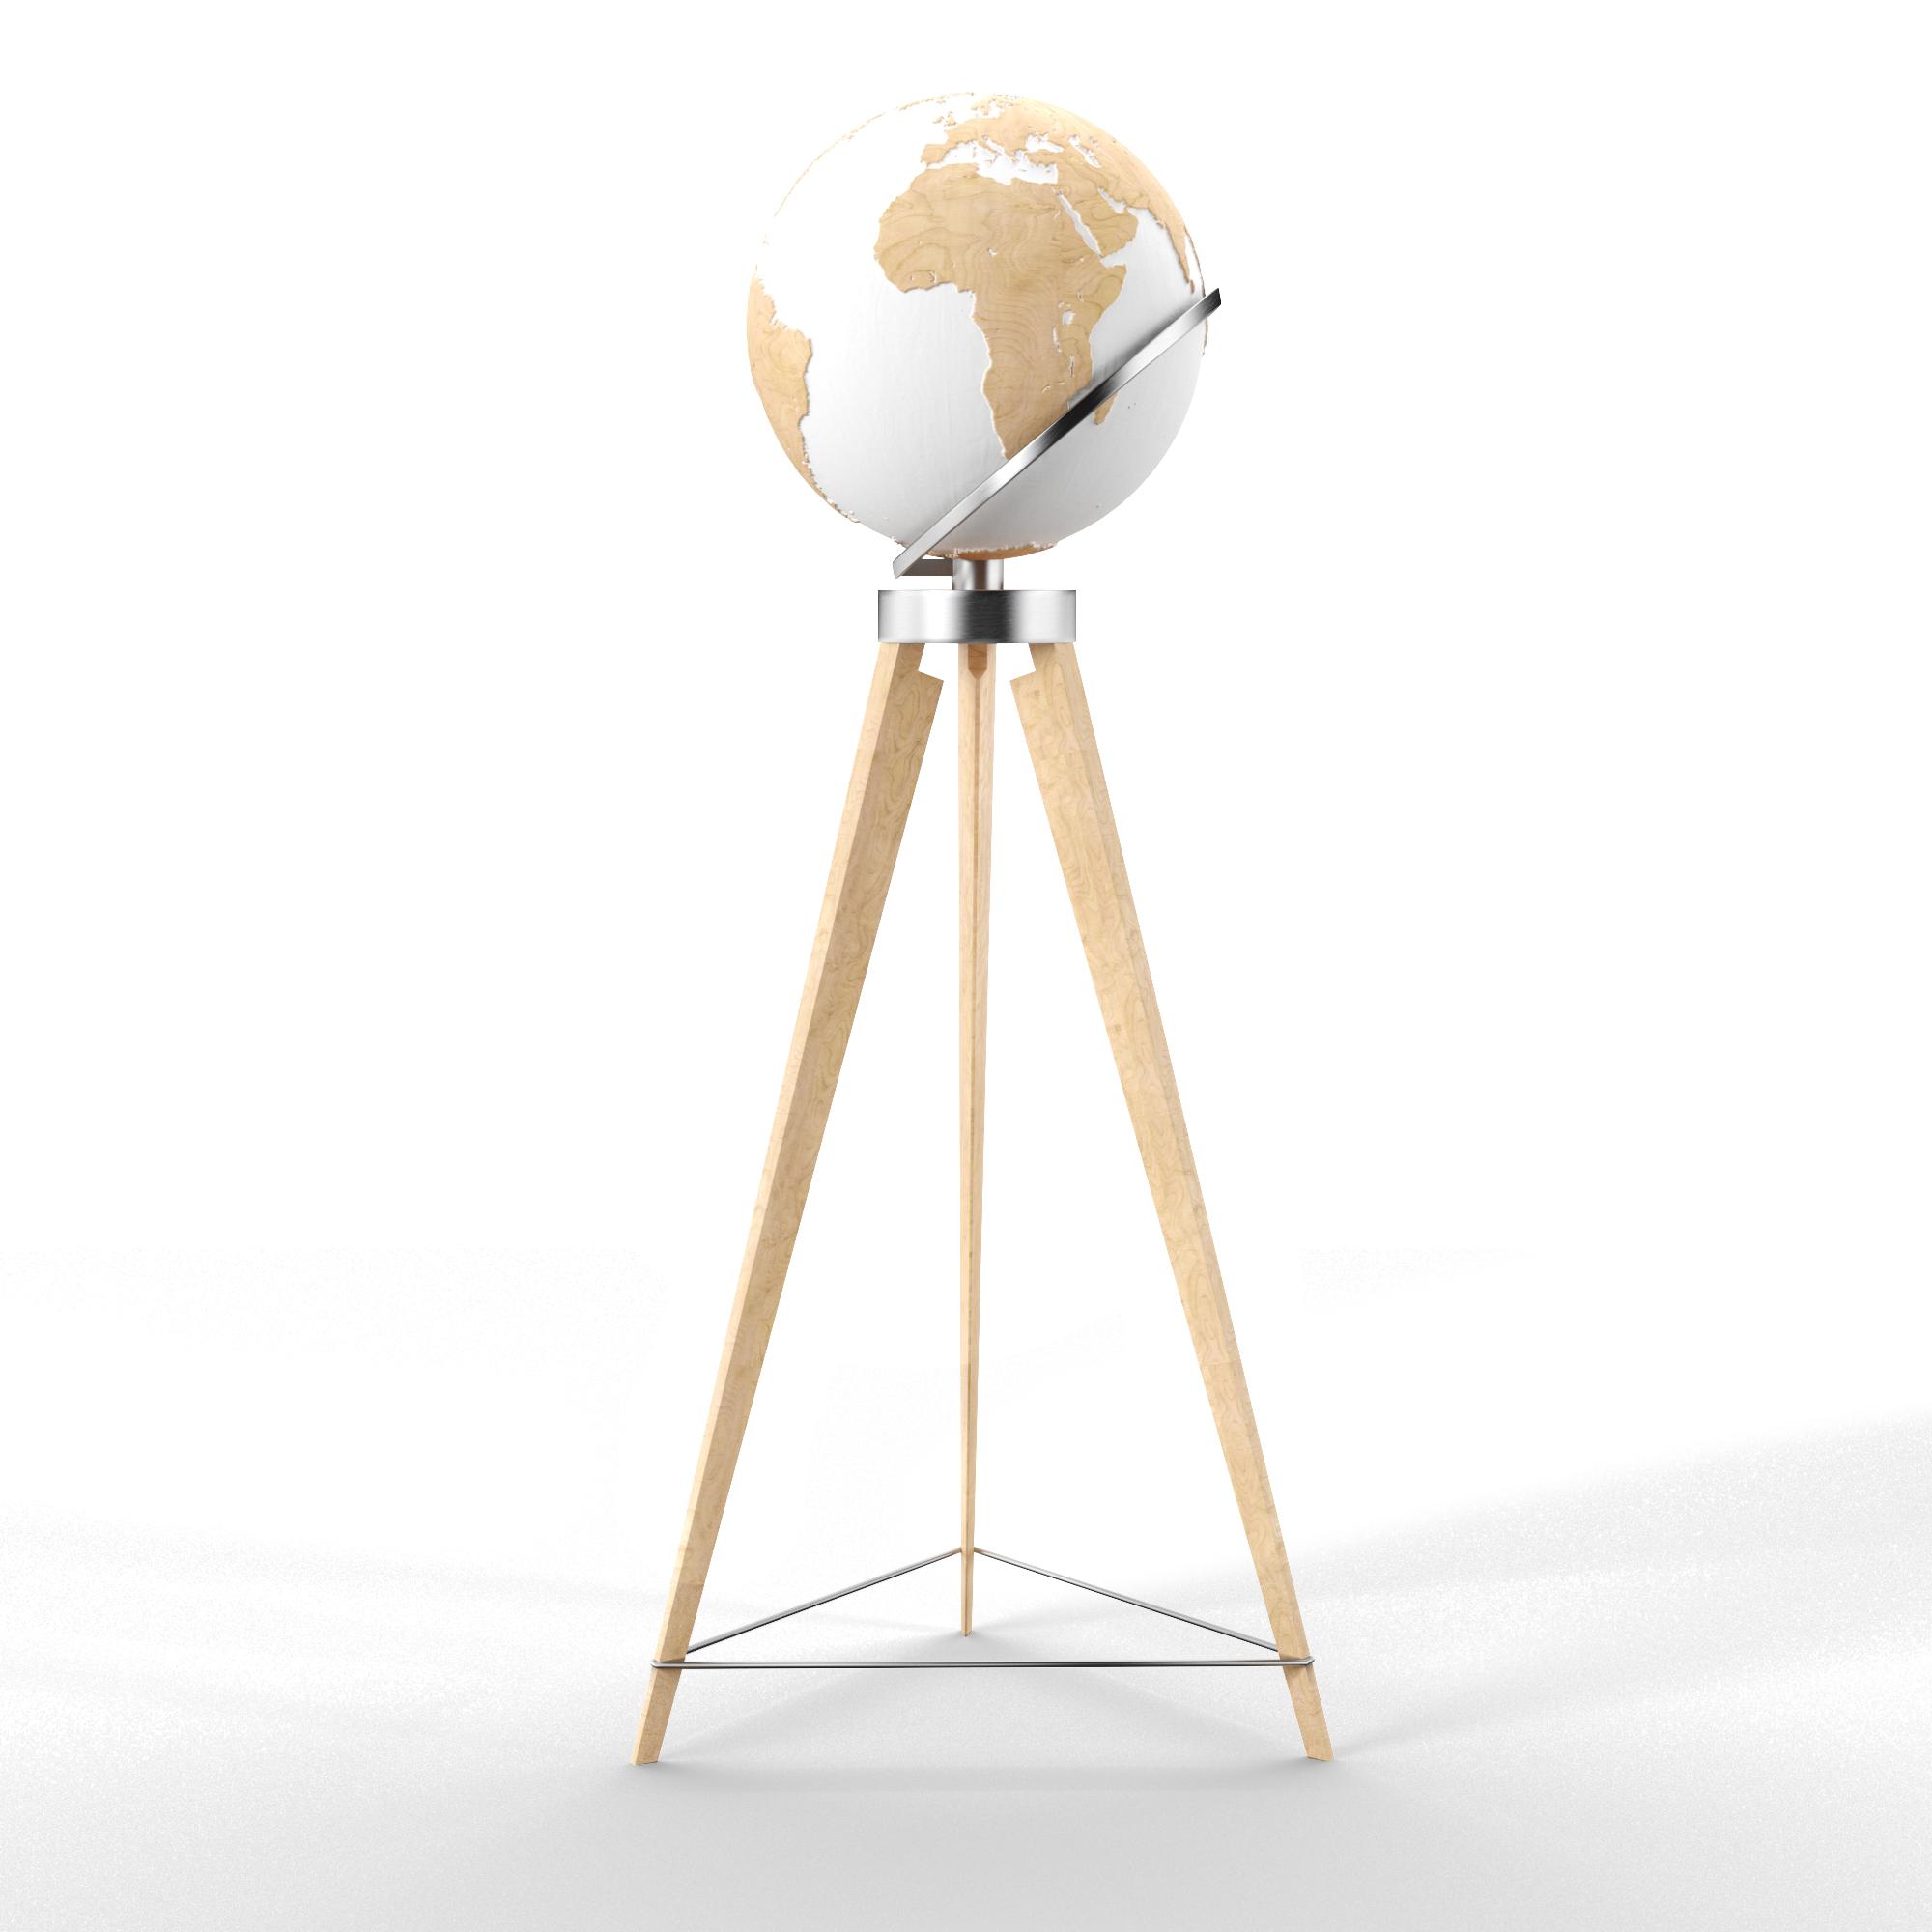 Globe - Maple Stainless steel